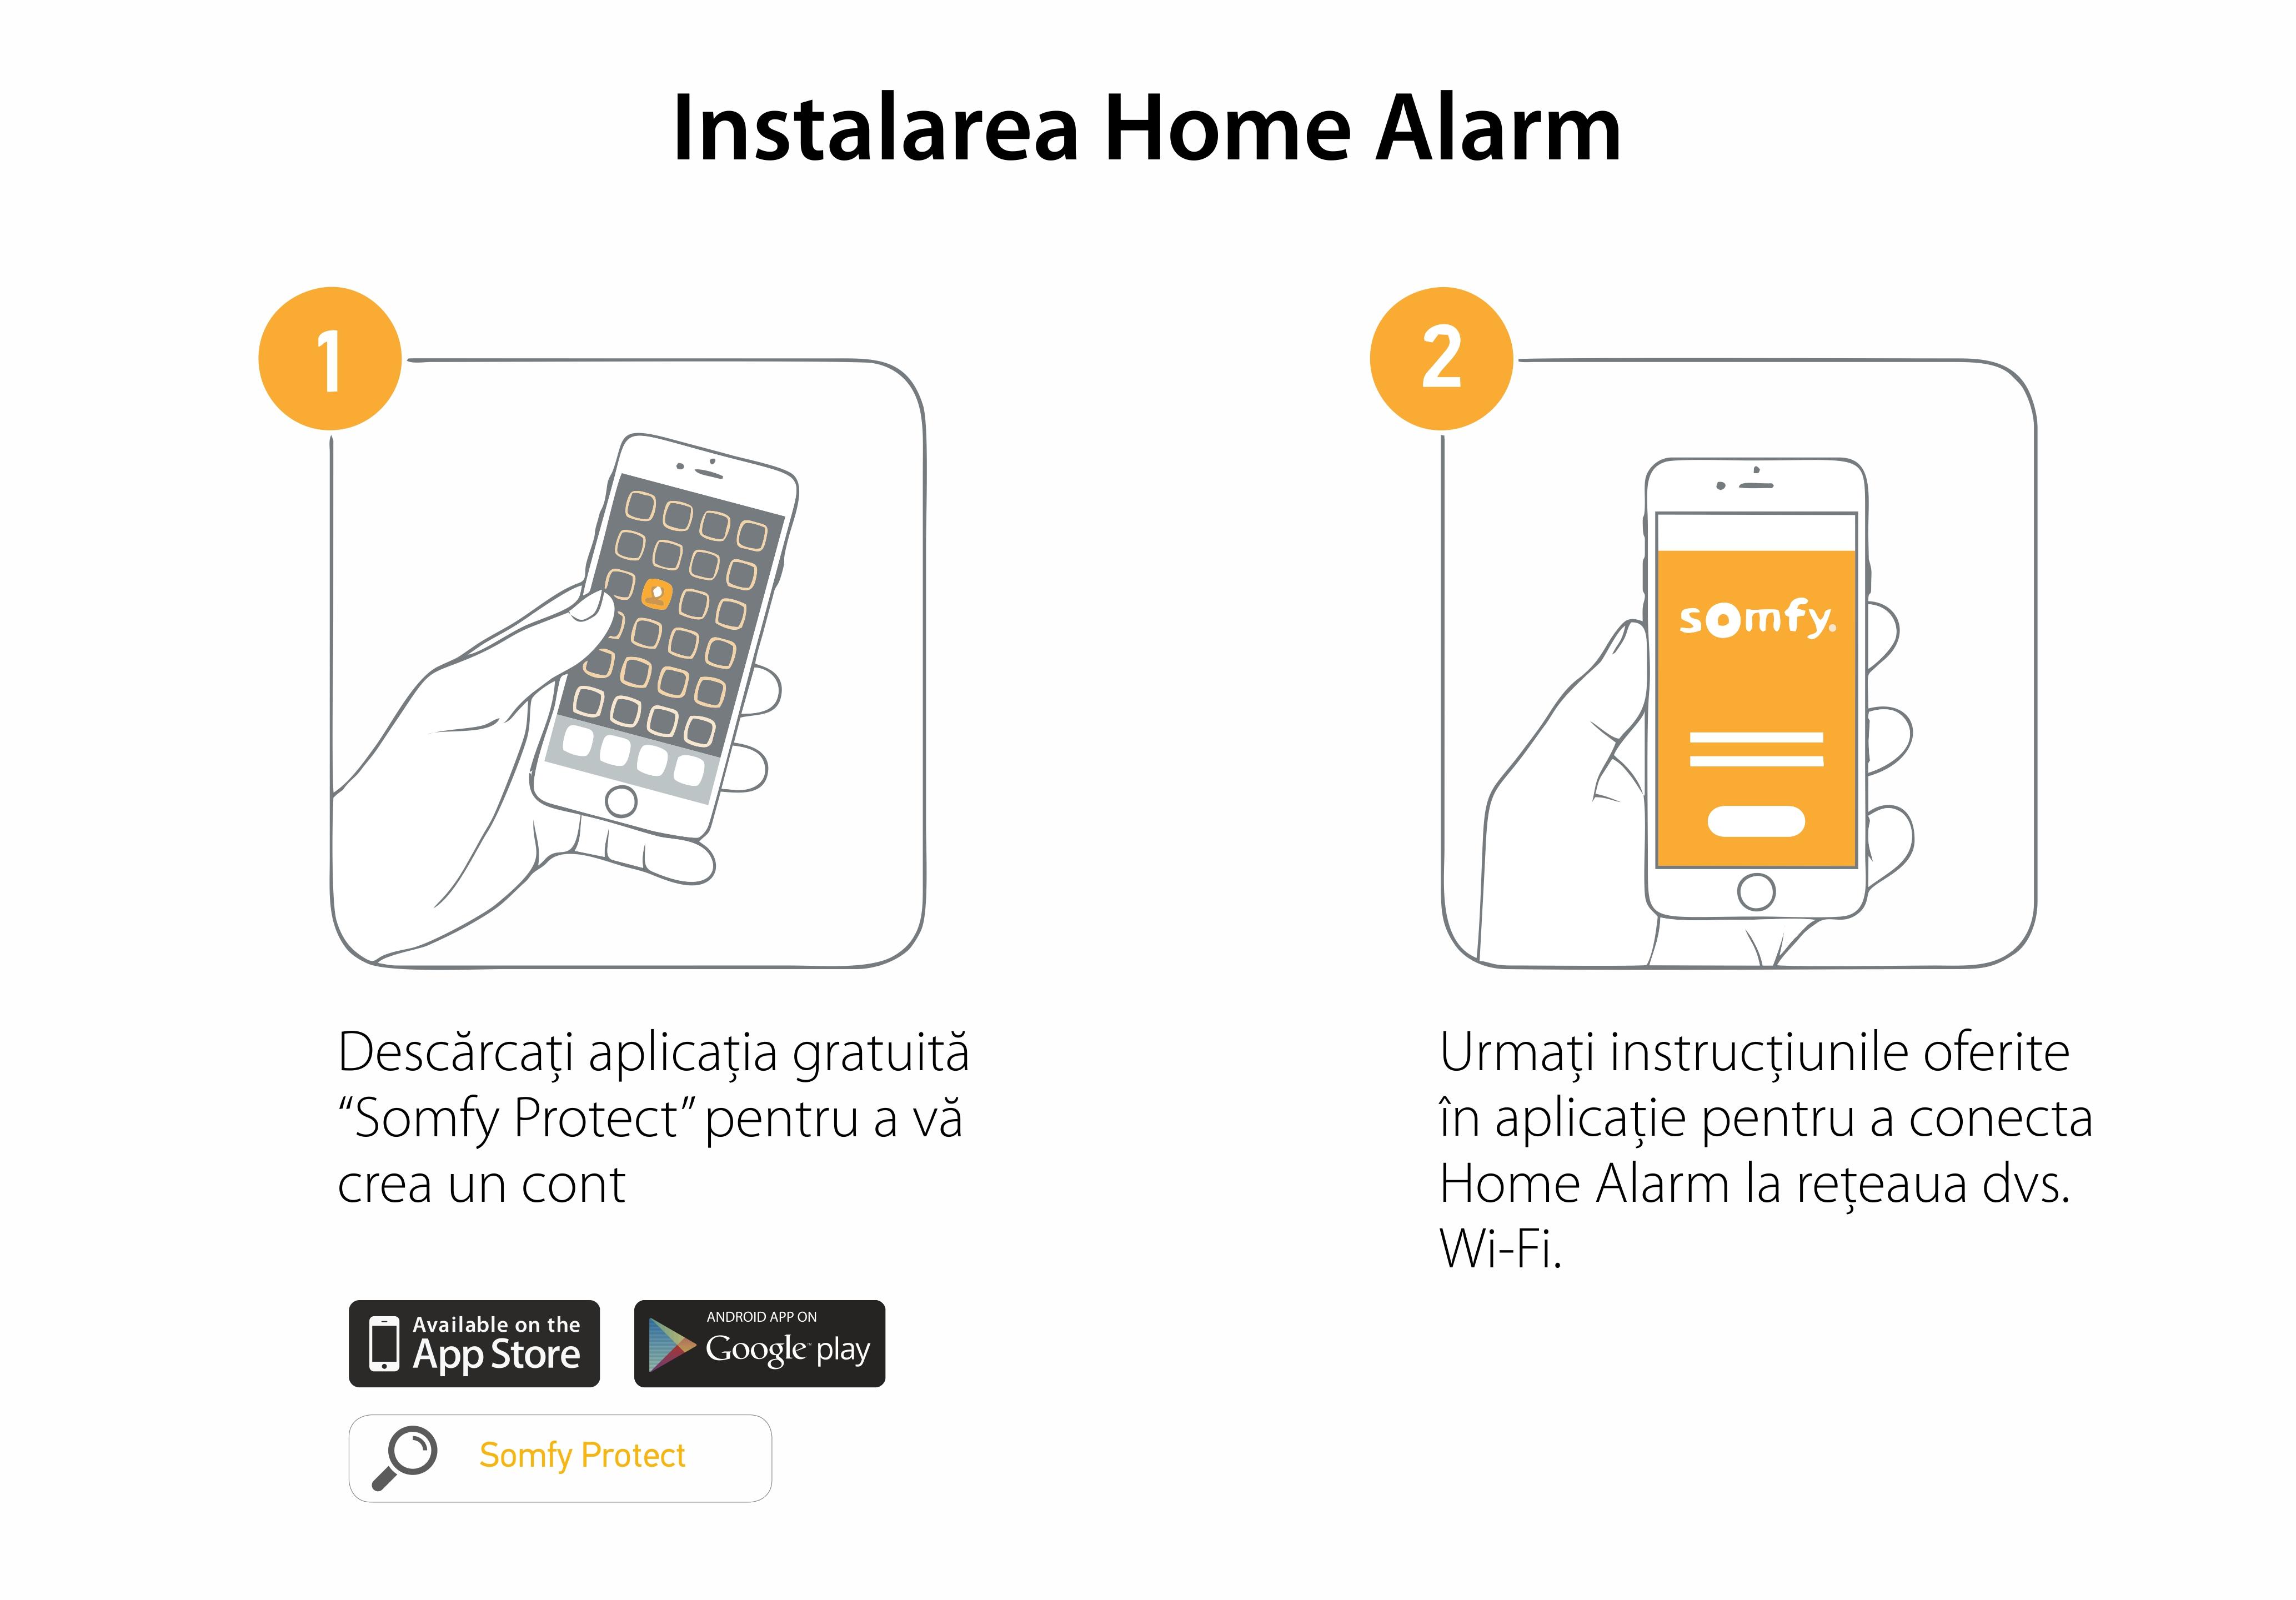 Pachet Somfy Home Alarm, Sirena de interior, Brelocuri si INTELLITAG™